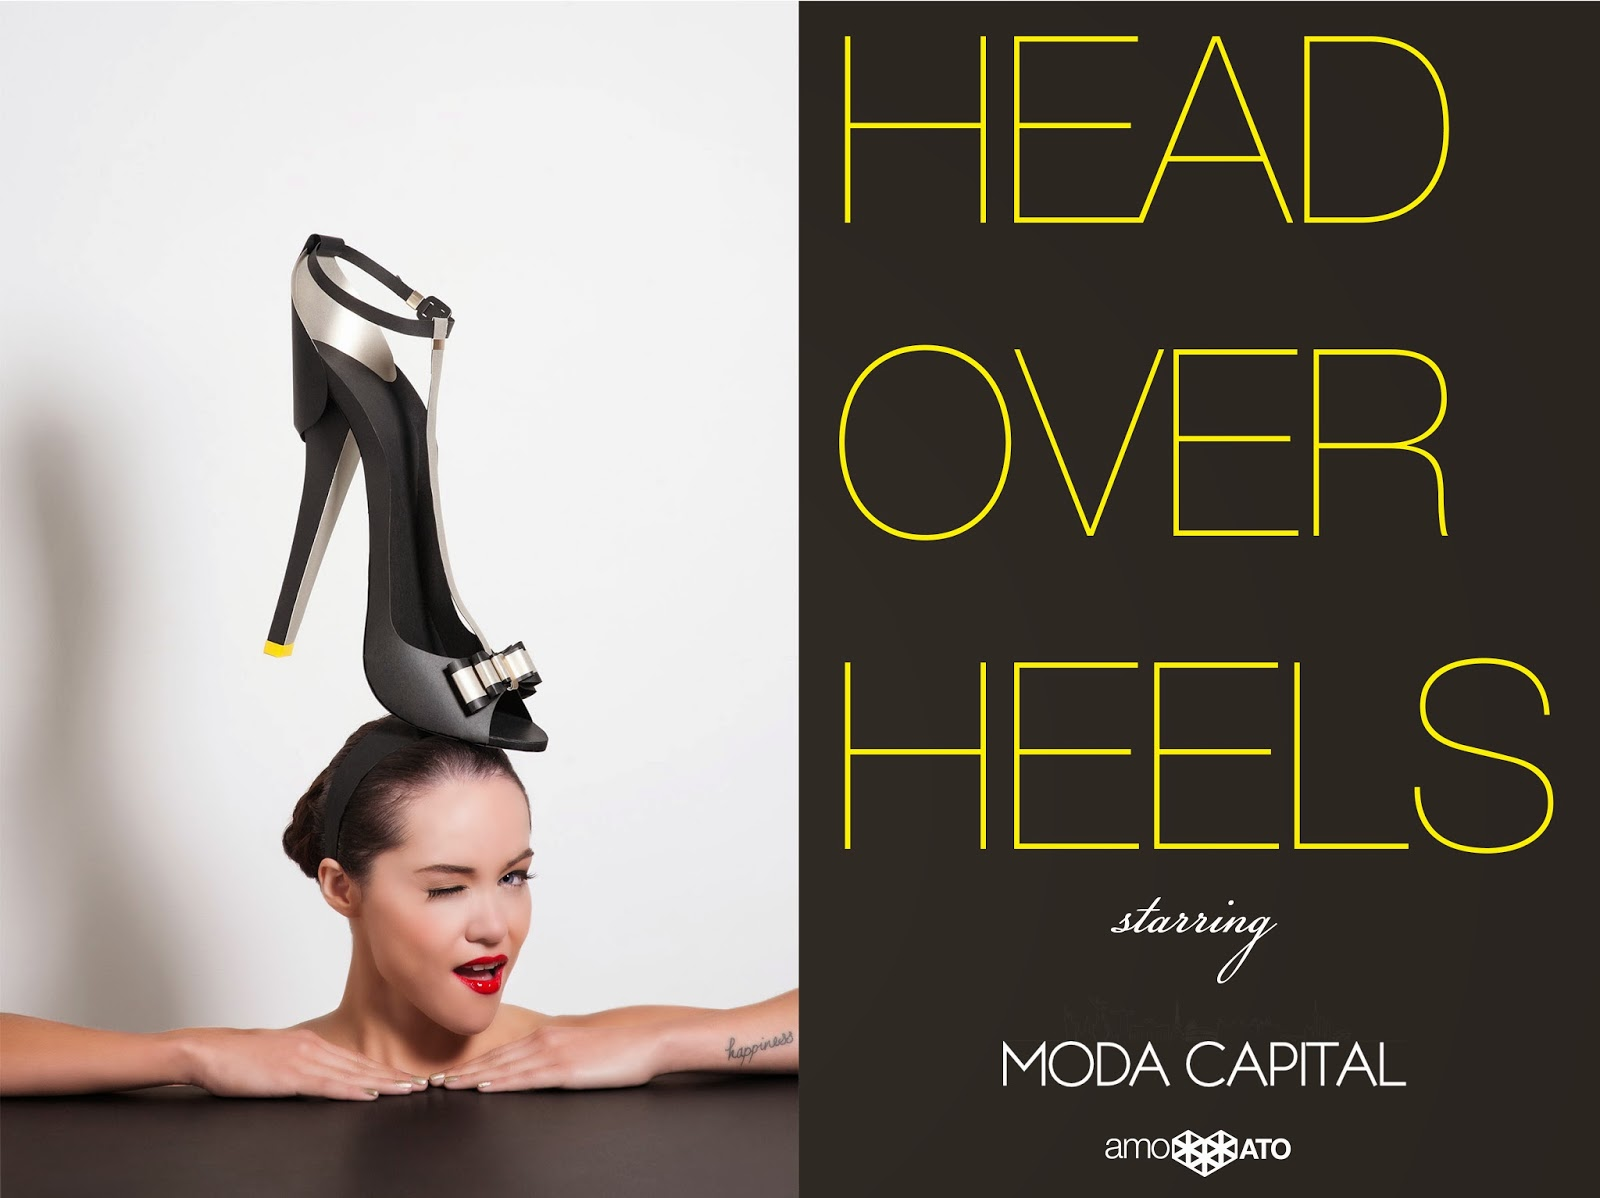 head over heels moda capital. Black Bedroom Furniture Sets. Home Design Ideas